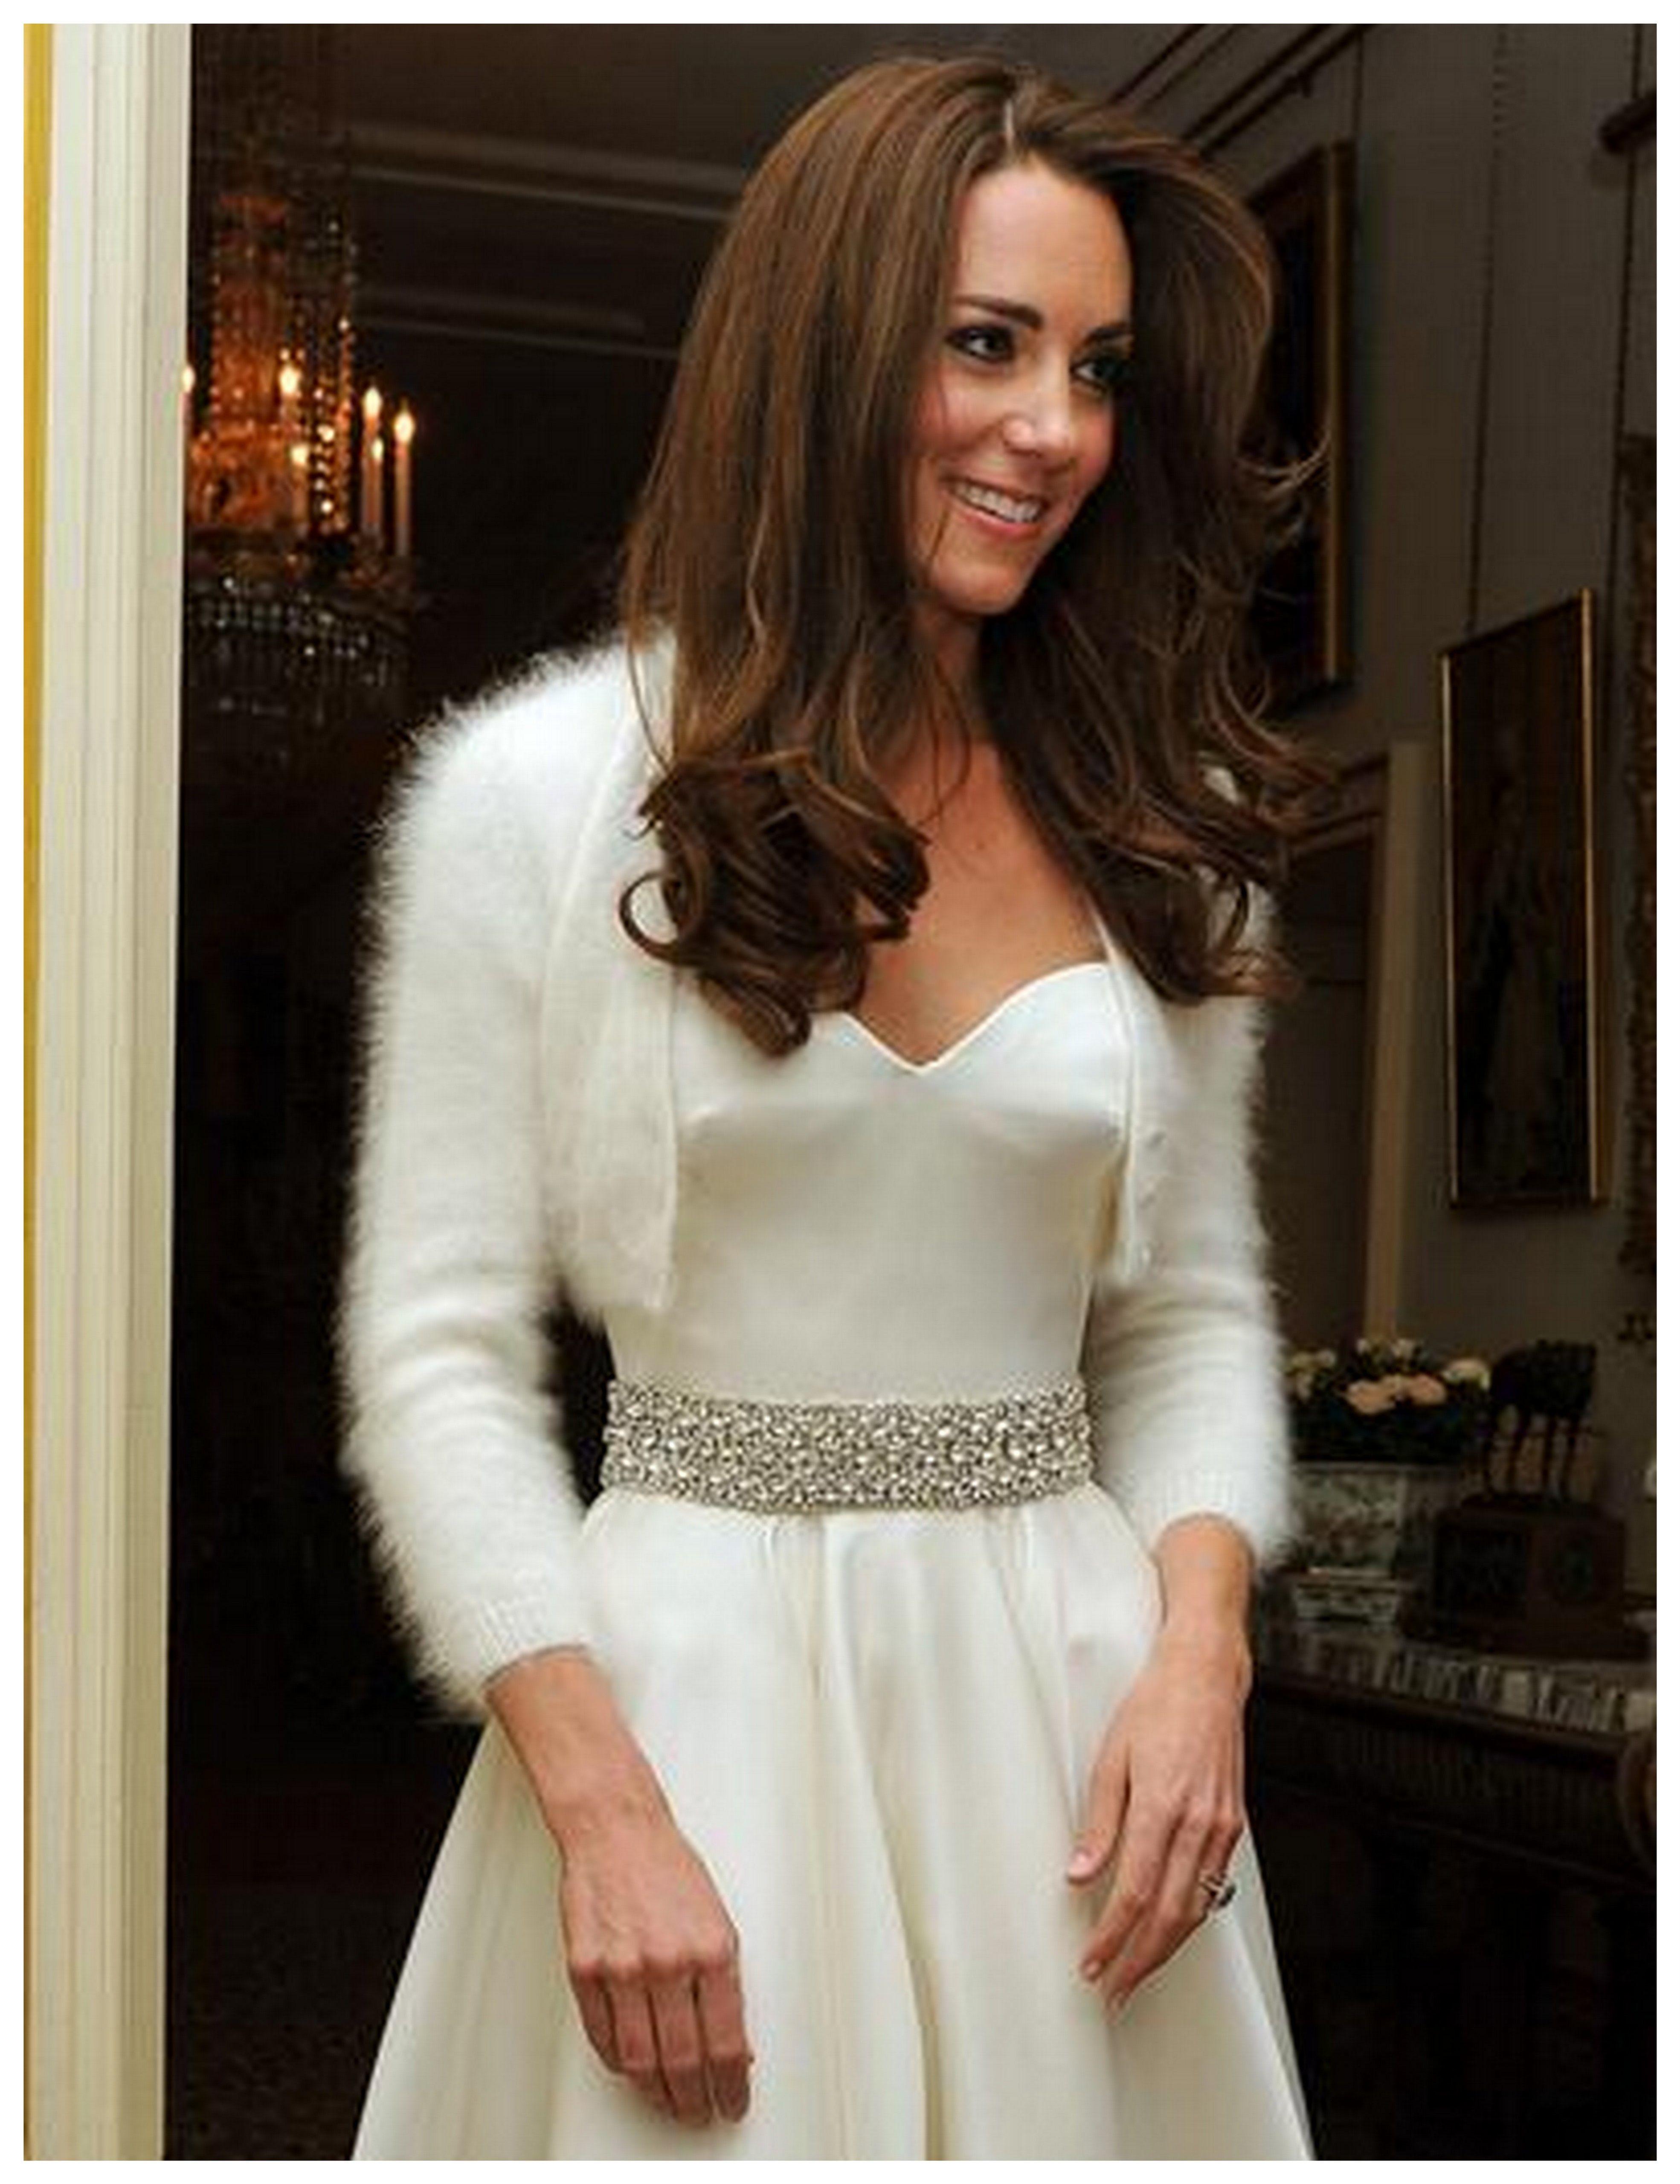 Brides In Cardigans Wedding Shrug Royal Weddings And Weddings